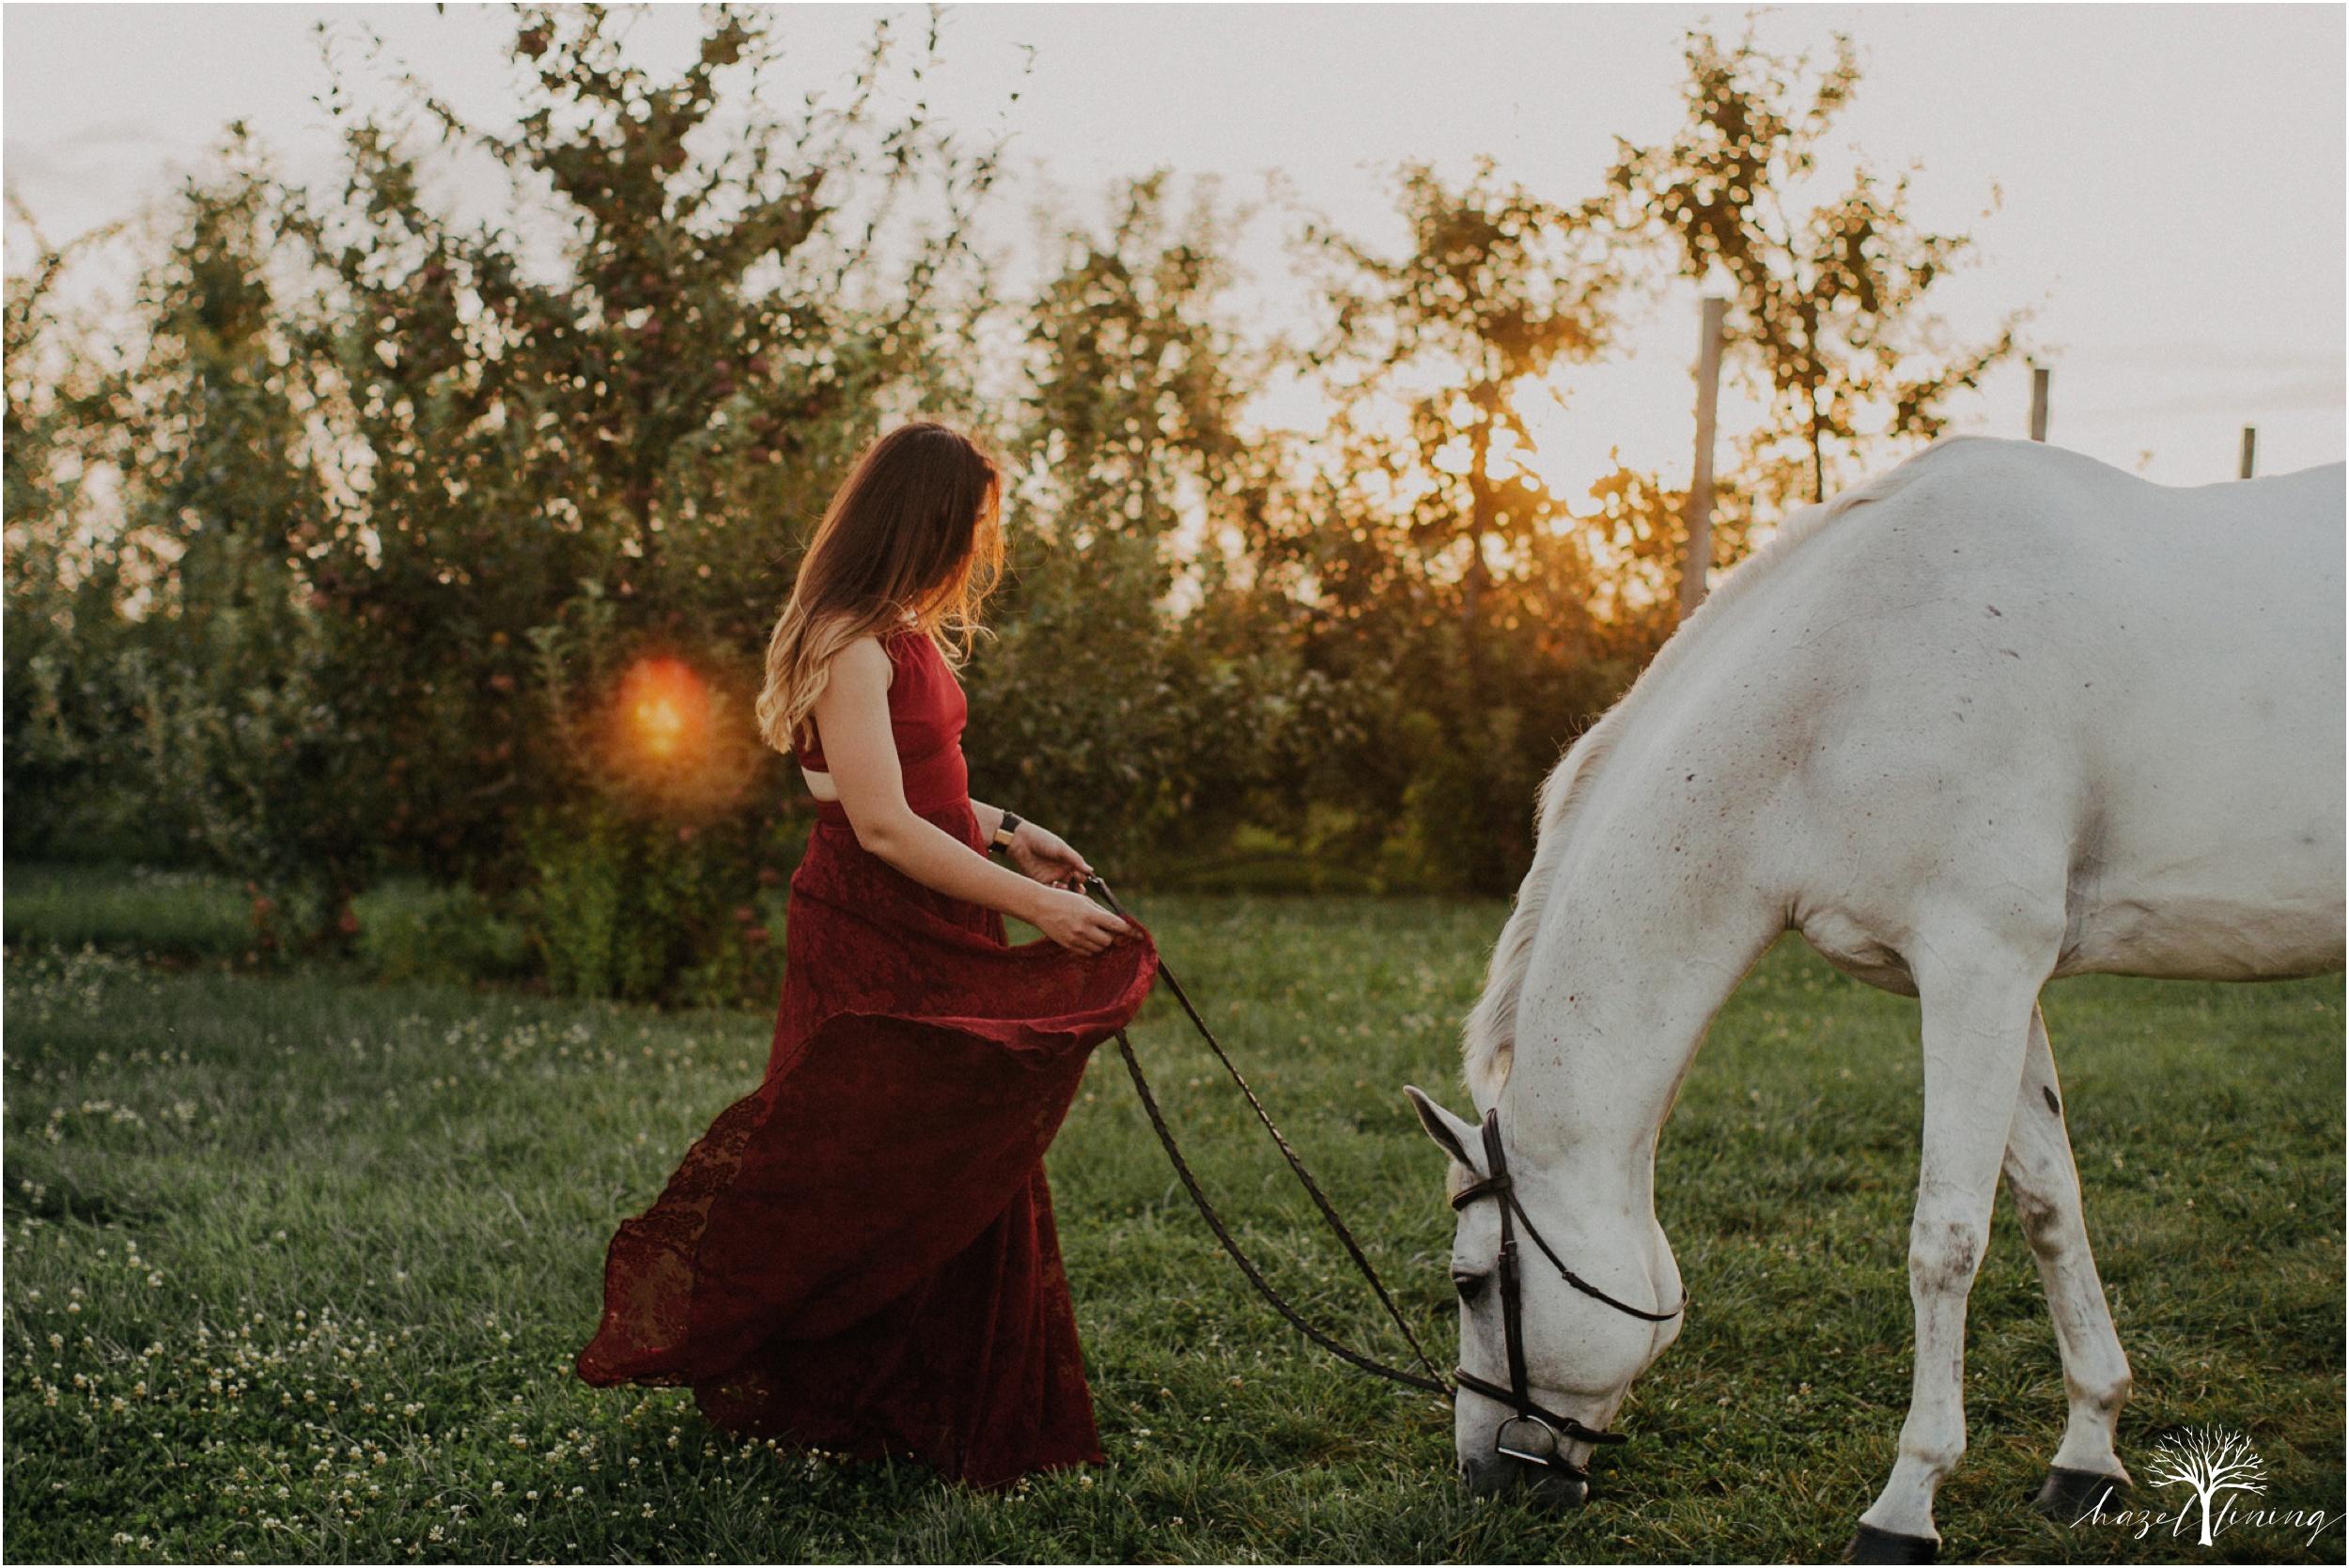 taylor-adams-and-horse-delaware-valley-university-delval-summer-equestrian-portrait-session-hazel-lining-photography-destination-elopement-wedding-engagement-photography_0069.jpg